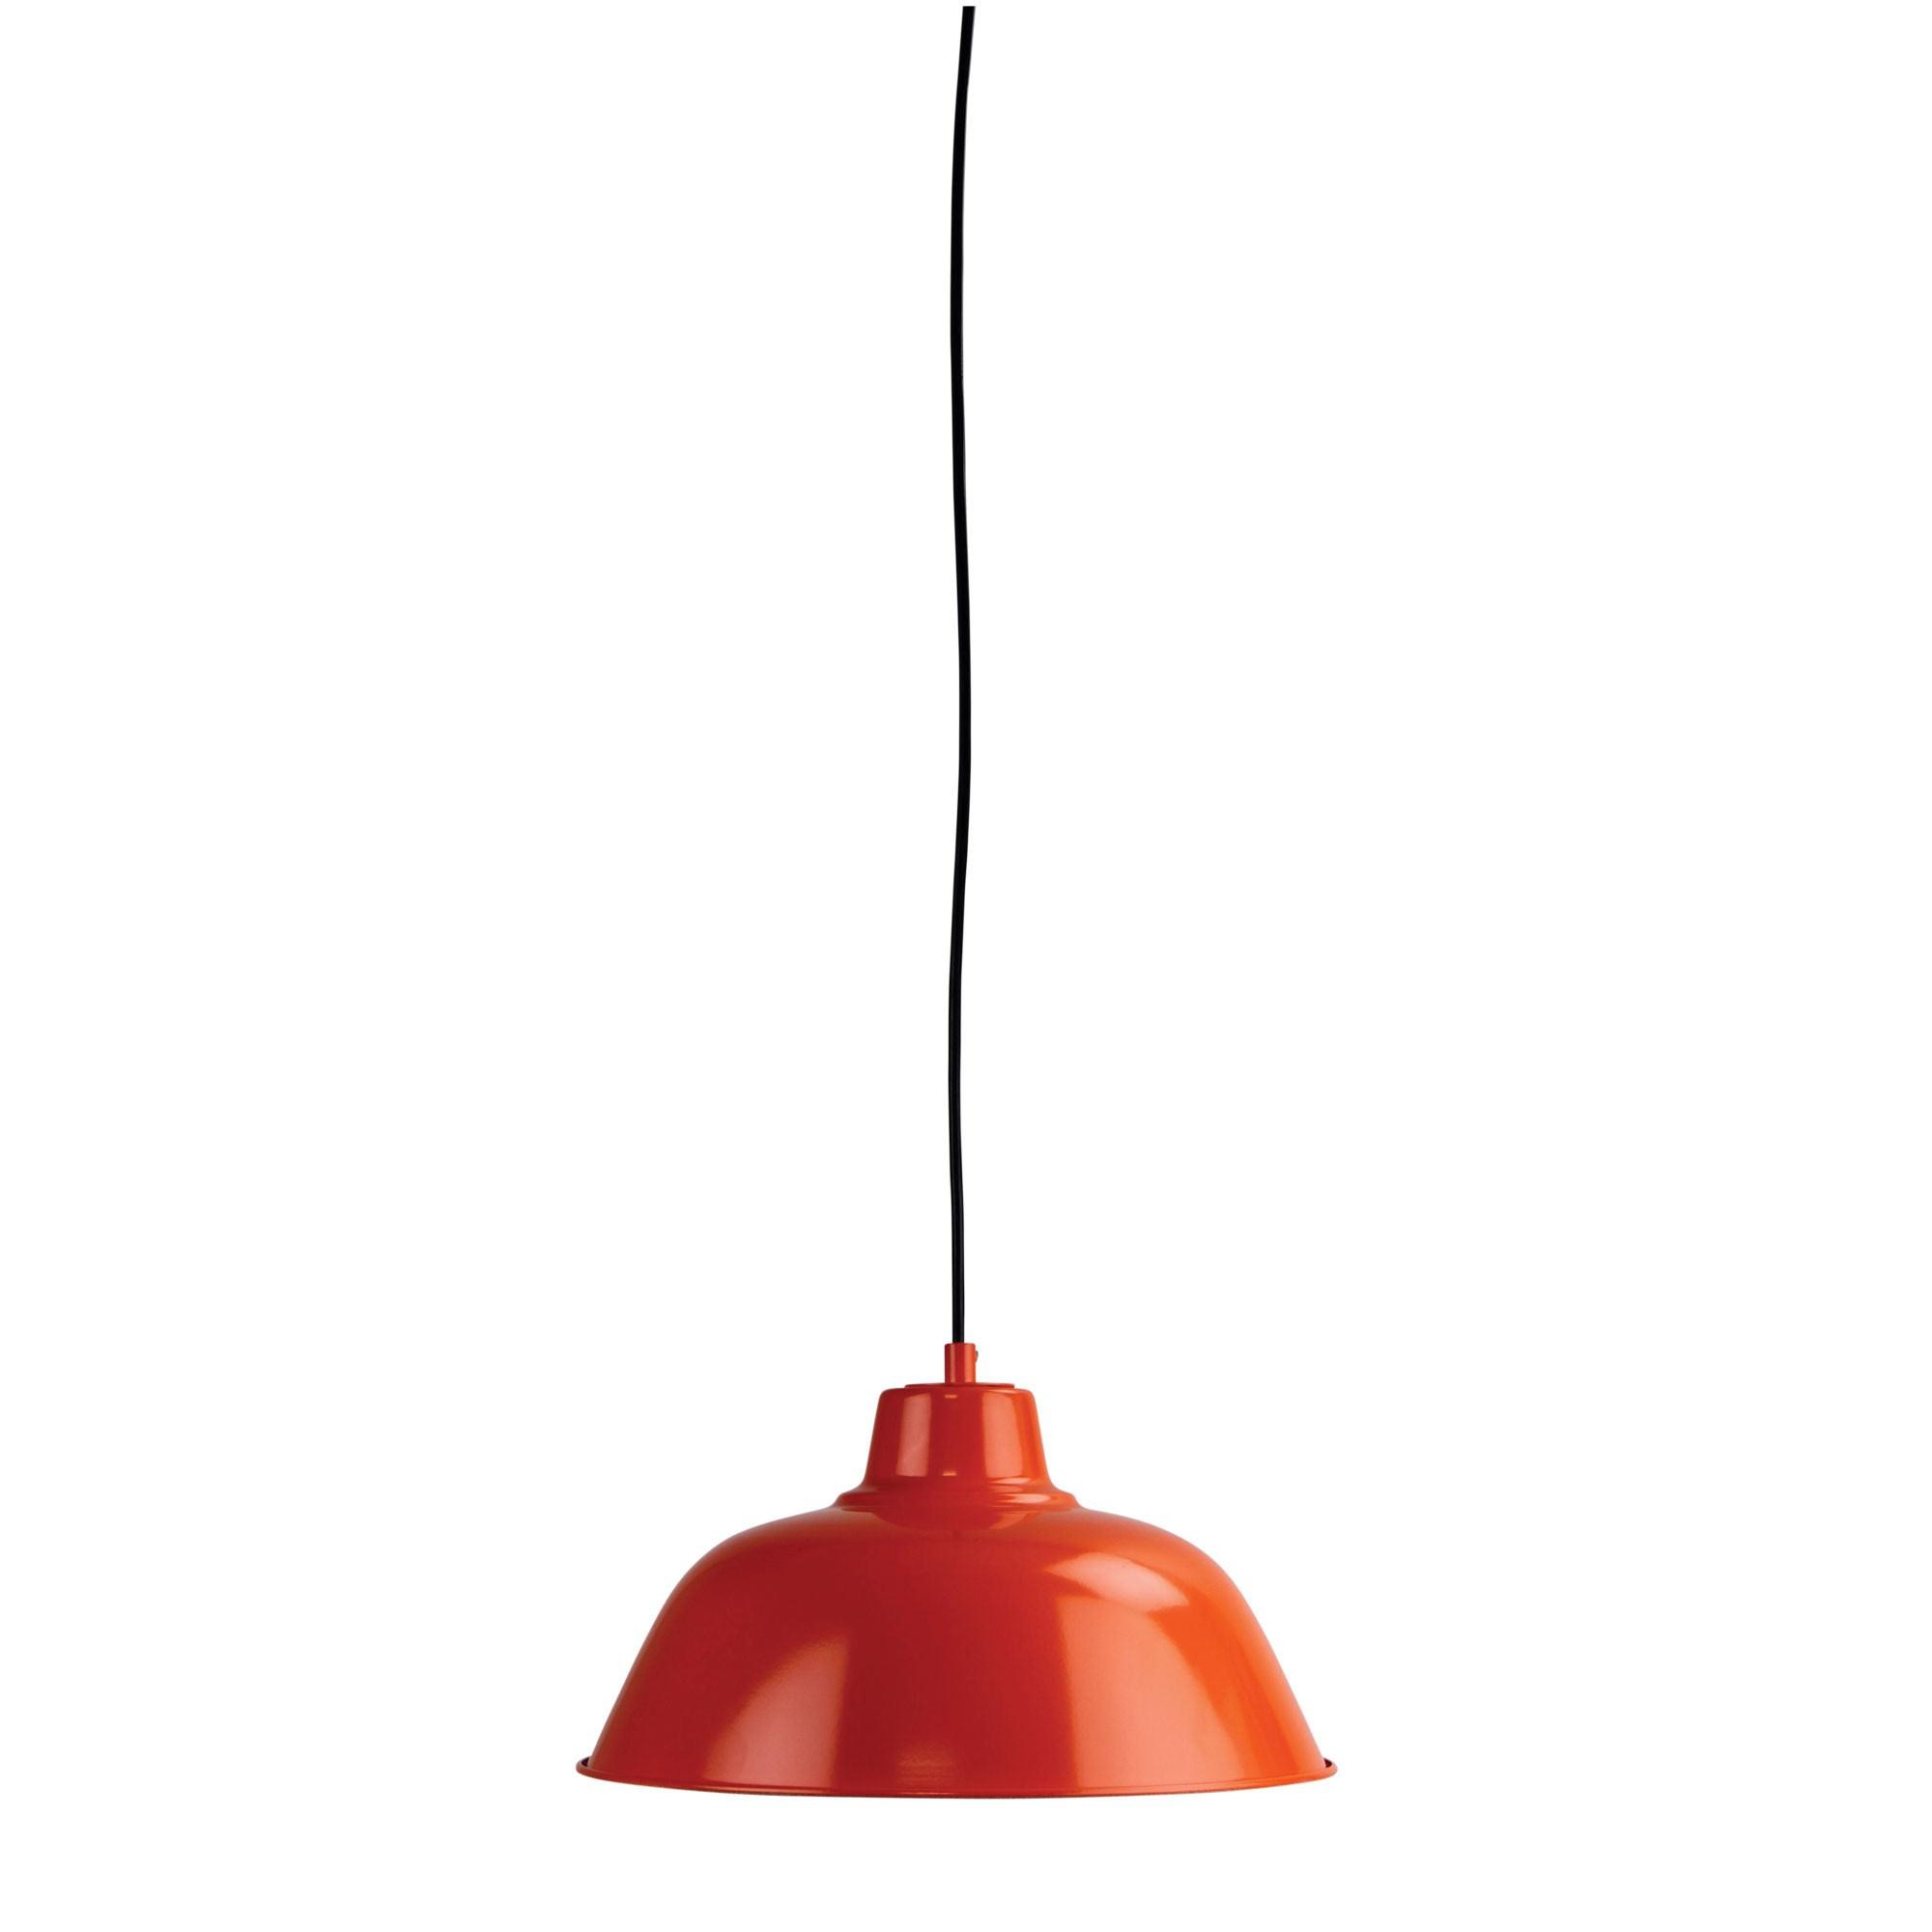 Forge Metal Pendant Light, 30cm, Orange